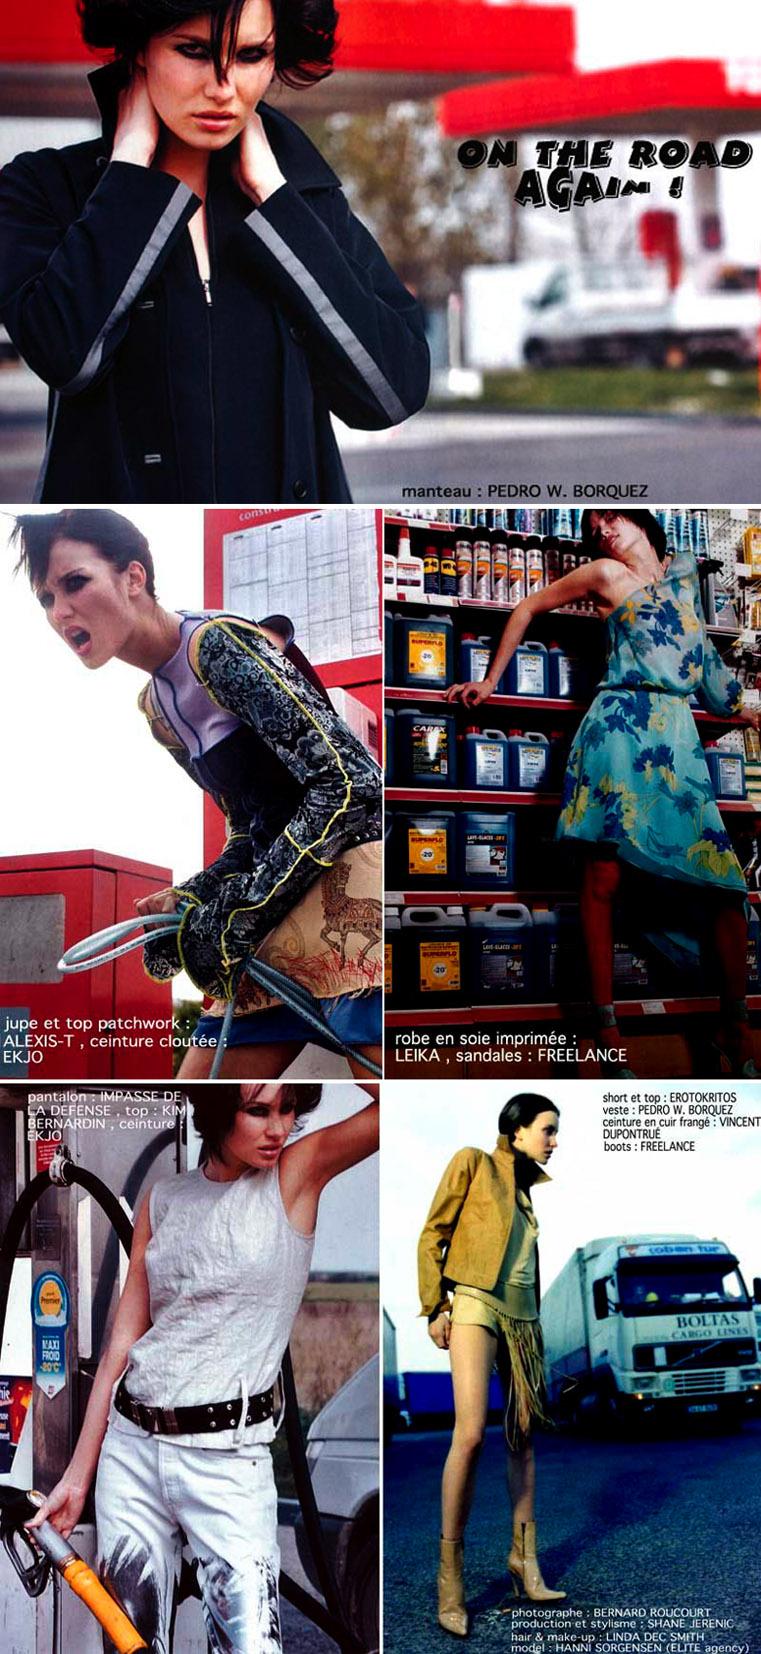 Paris Sep 06, 2008 bernard.roucourt@skynet.be Da niouzs magazine (Hanni from Elite agency)